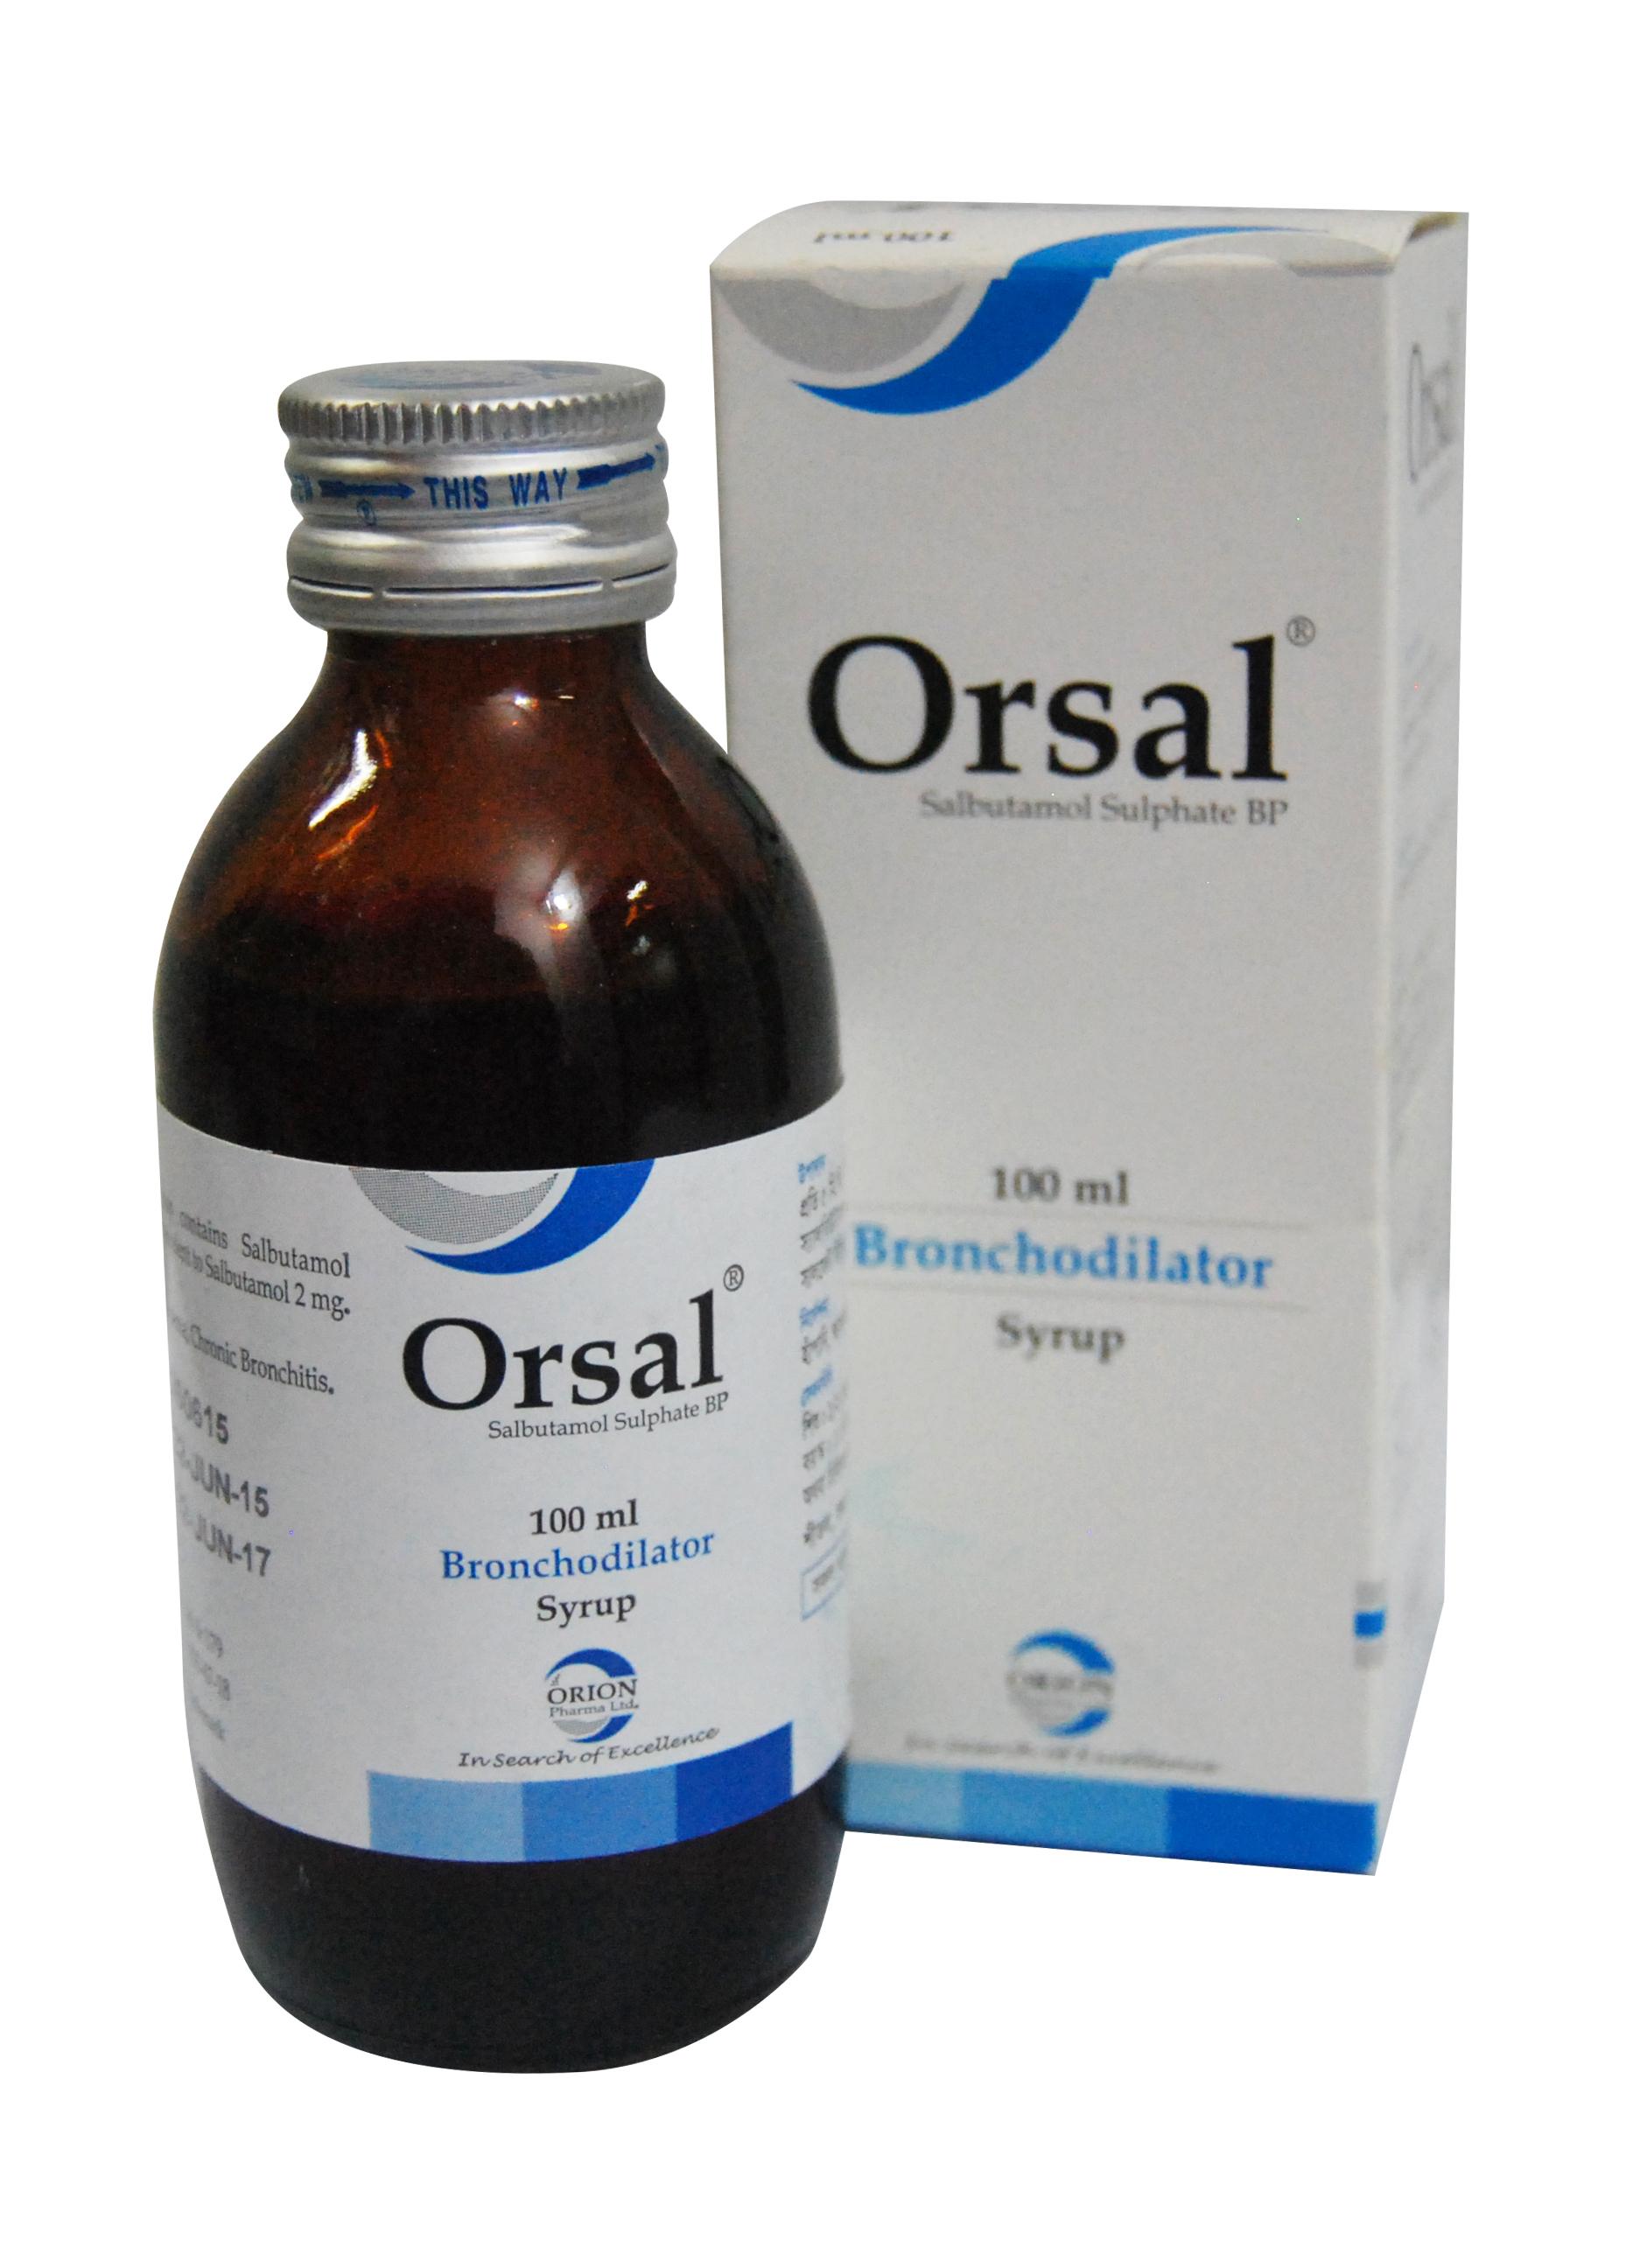 Orsal